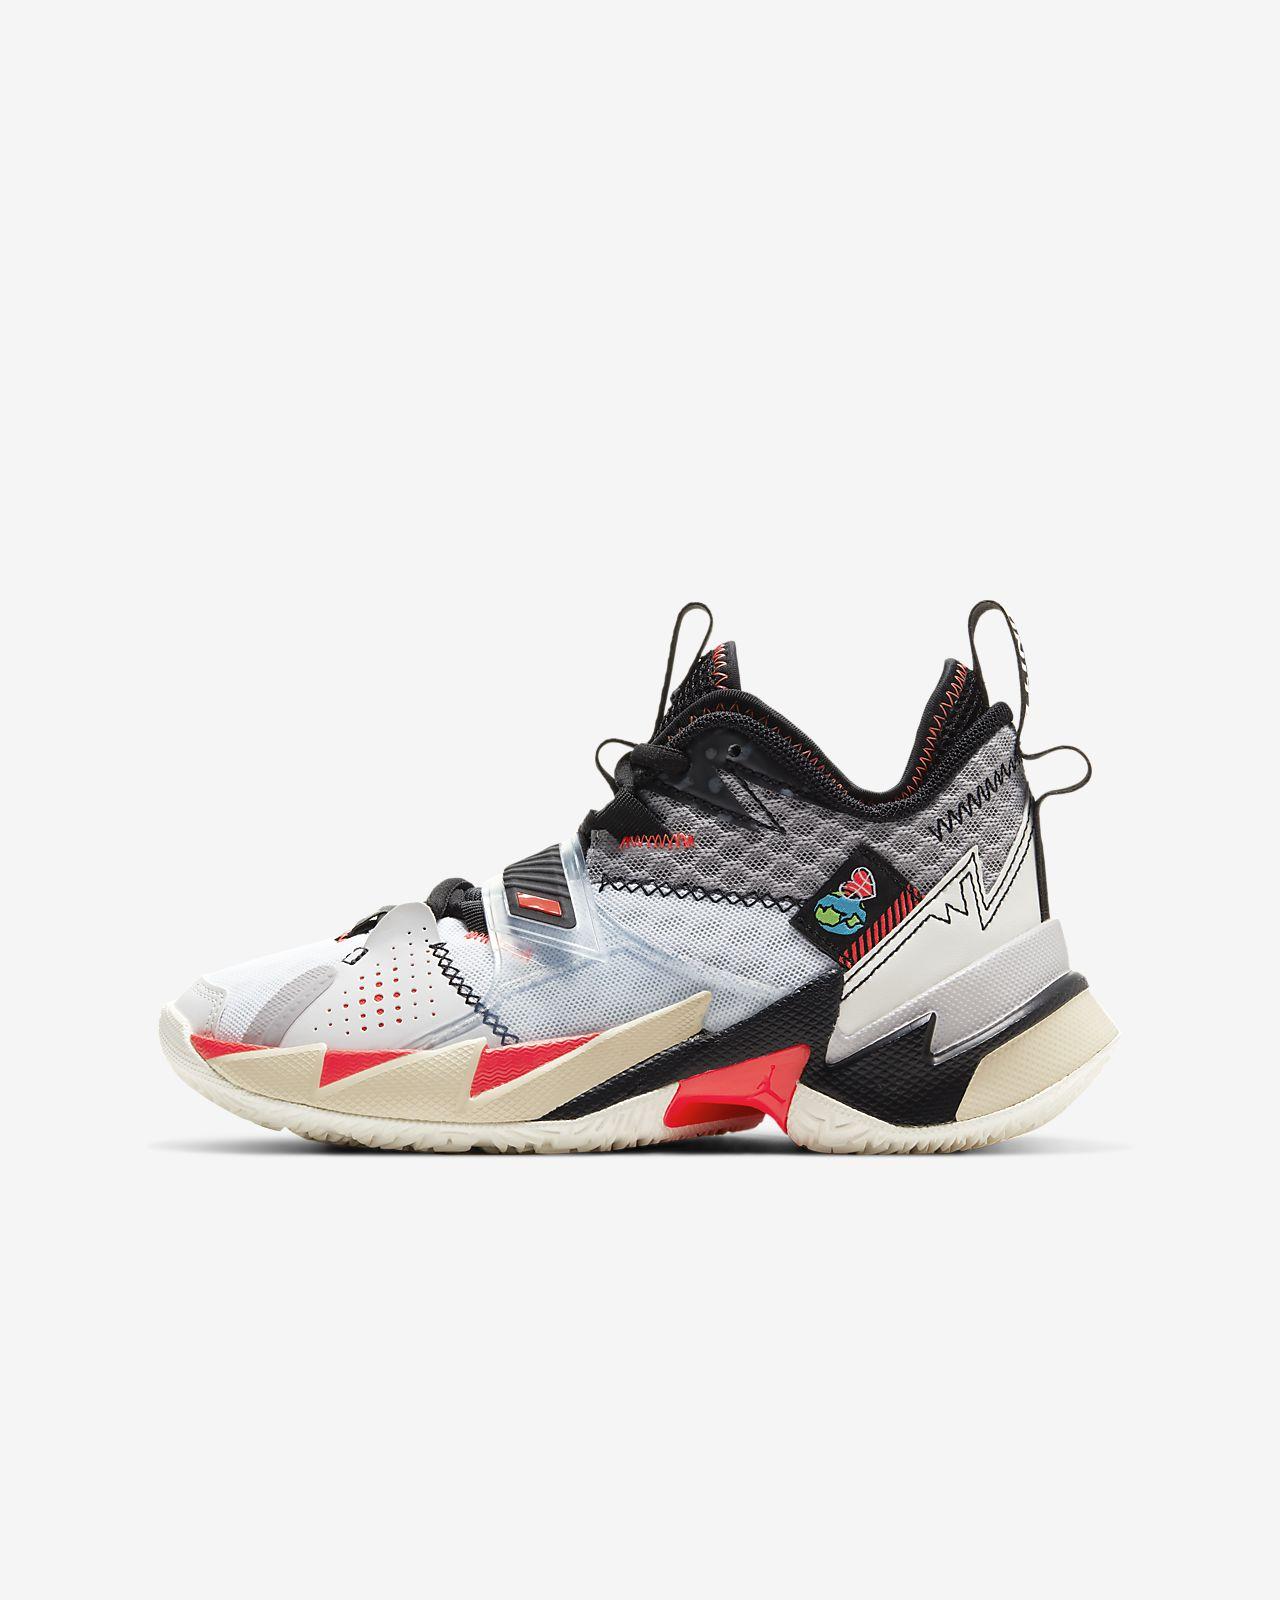 Jordan 'Why Not?' Zer0.3 Older Kids' Basketball Shoe